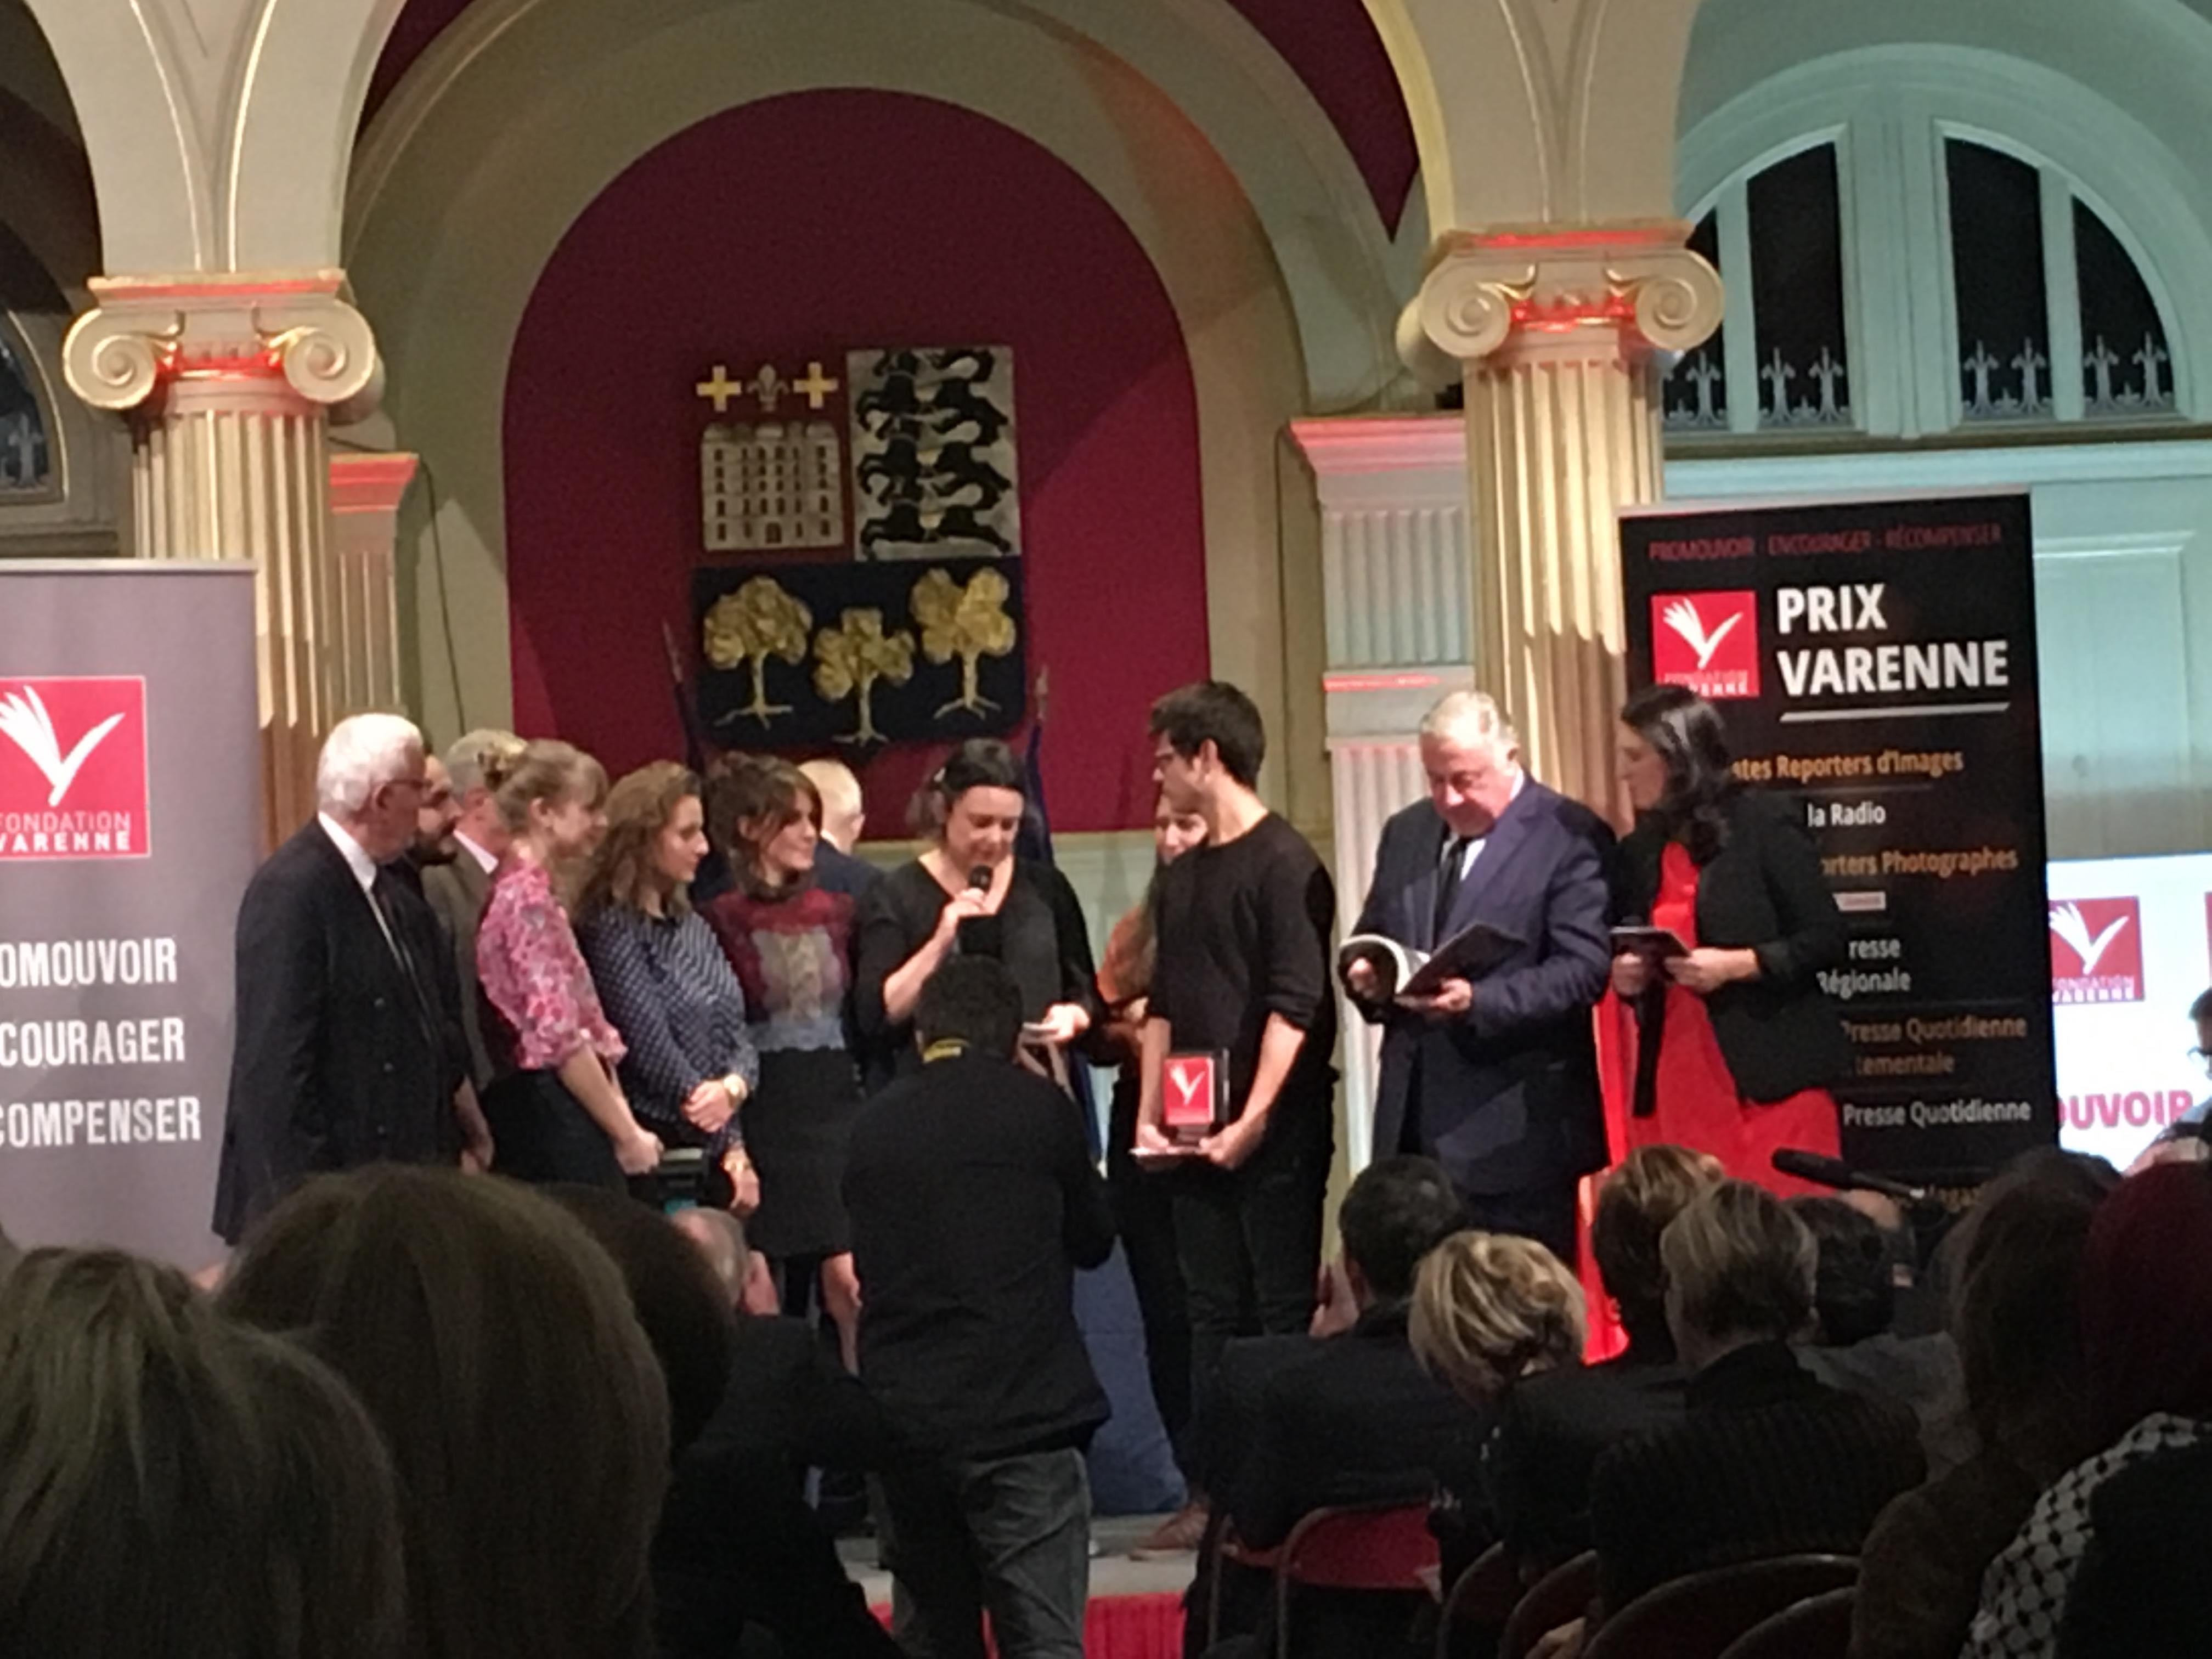 IJBA Prix Varenne journal école 2018,